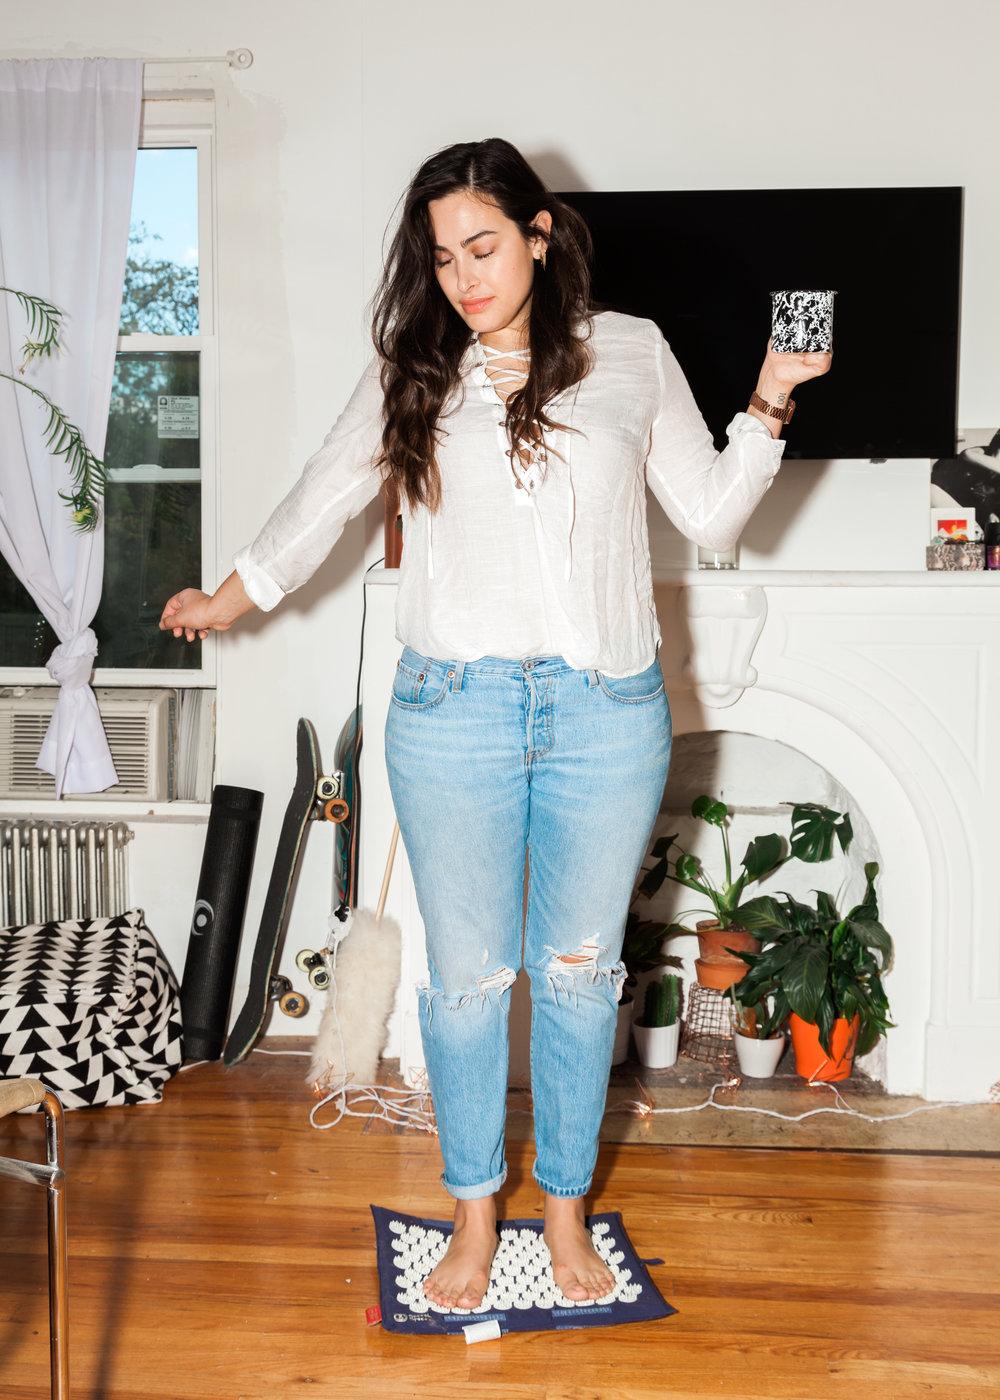 Top, Isabel Marant Etoile ; Jeans, Levi's ;Accupressure Mat, Nayoya